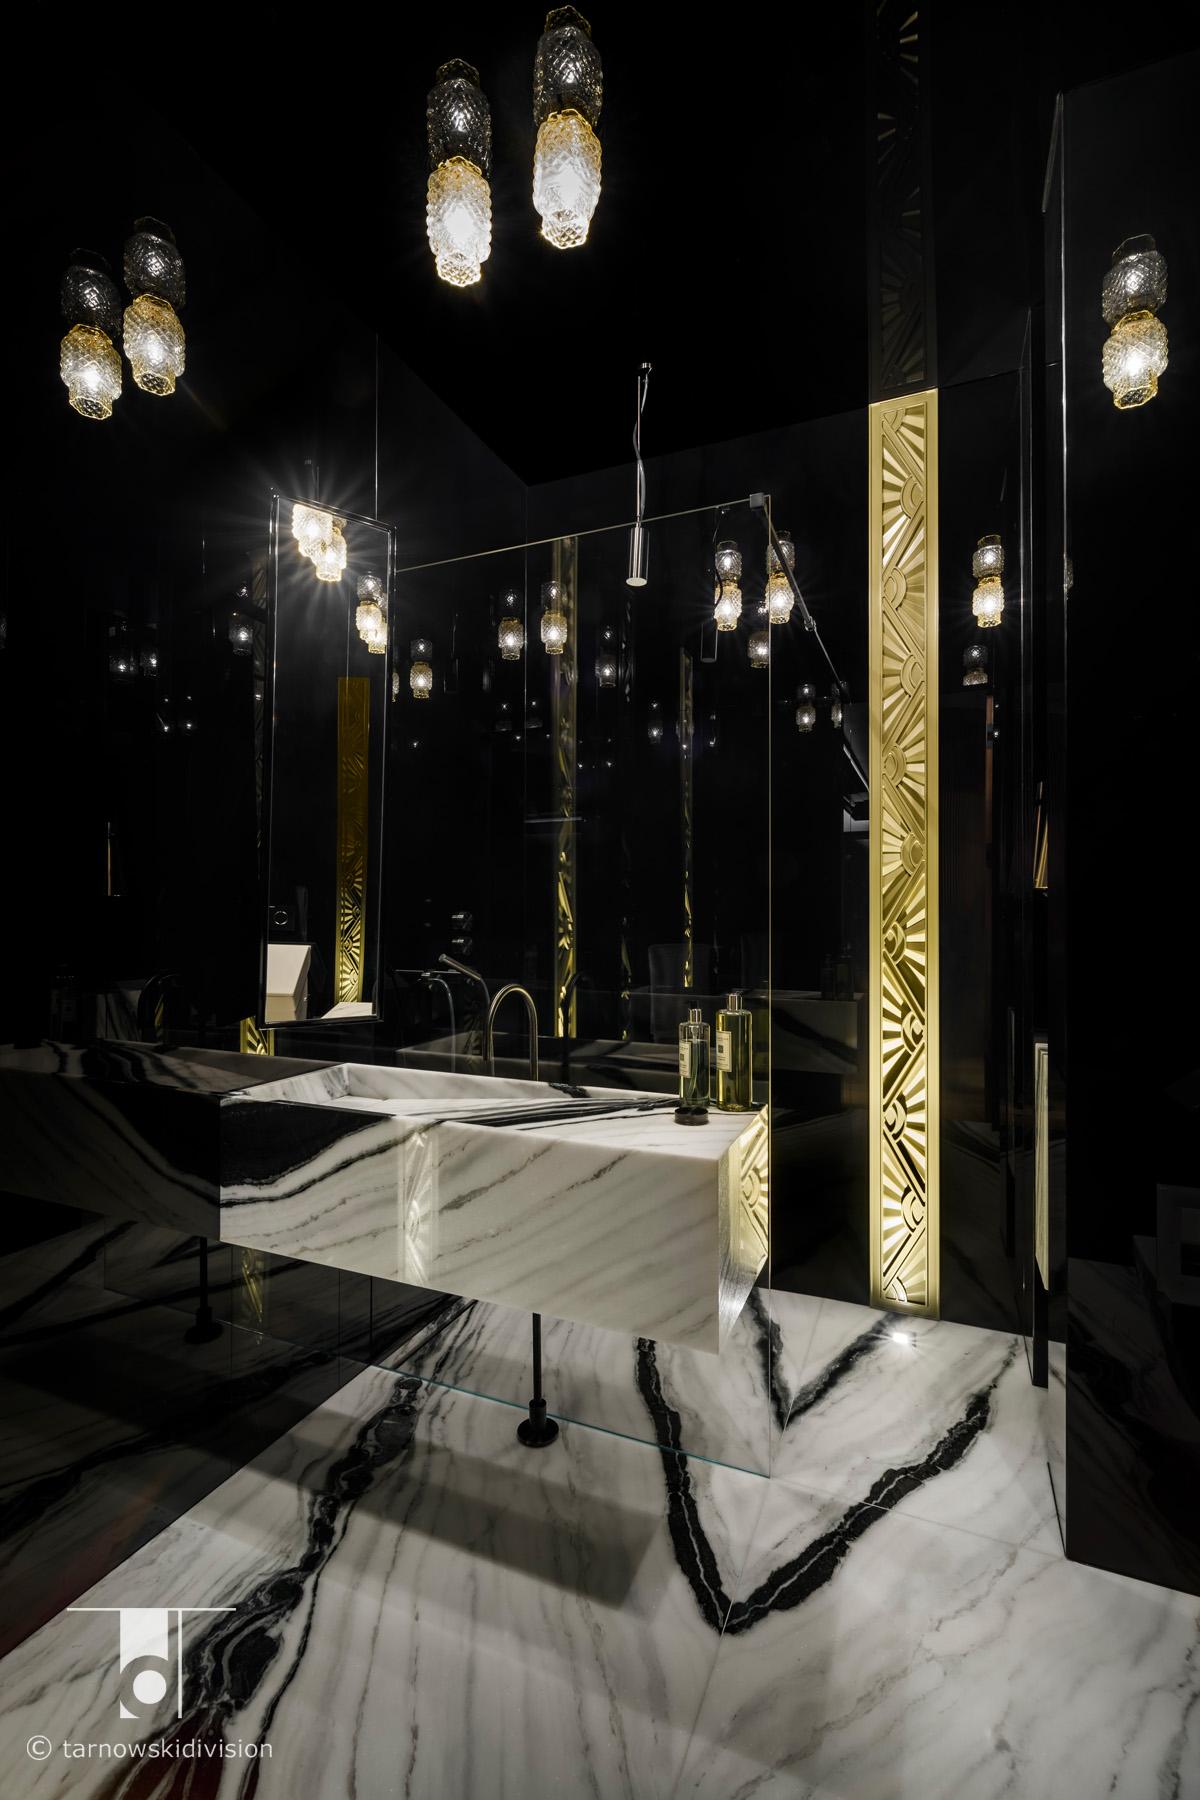 luksusowa łazienka kamienna marmurowa łazienka ekstrawagancka marble bathroom interior_tarnowski division